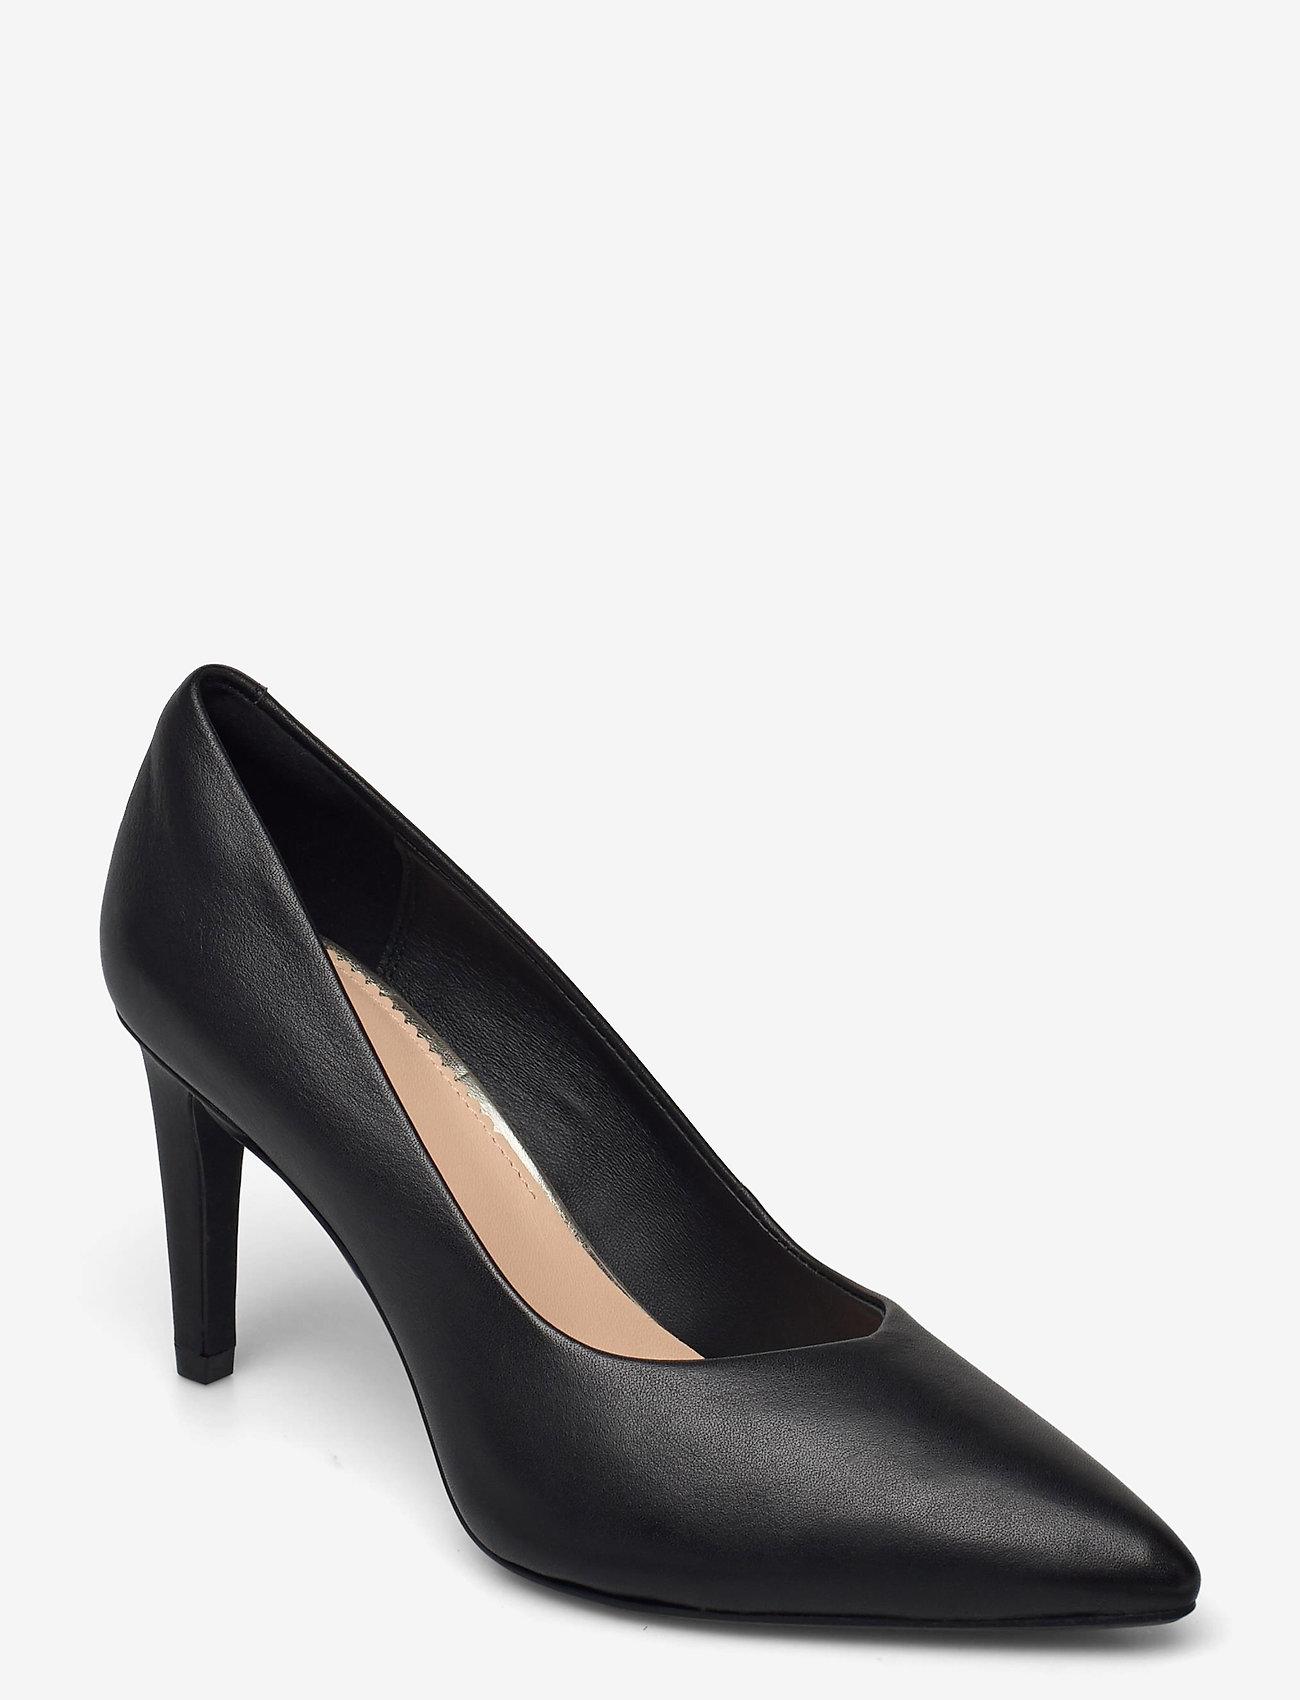 Clarks - Genoa85 Court - klassiska pumps - black leather - 1